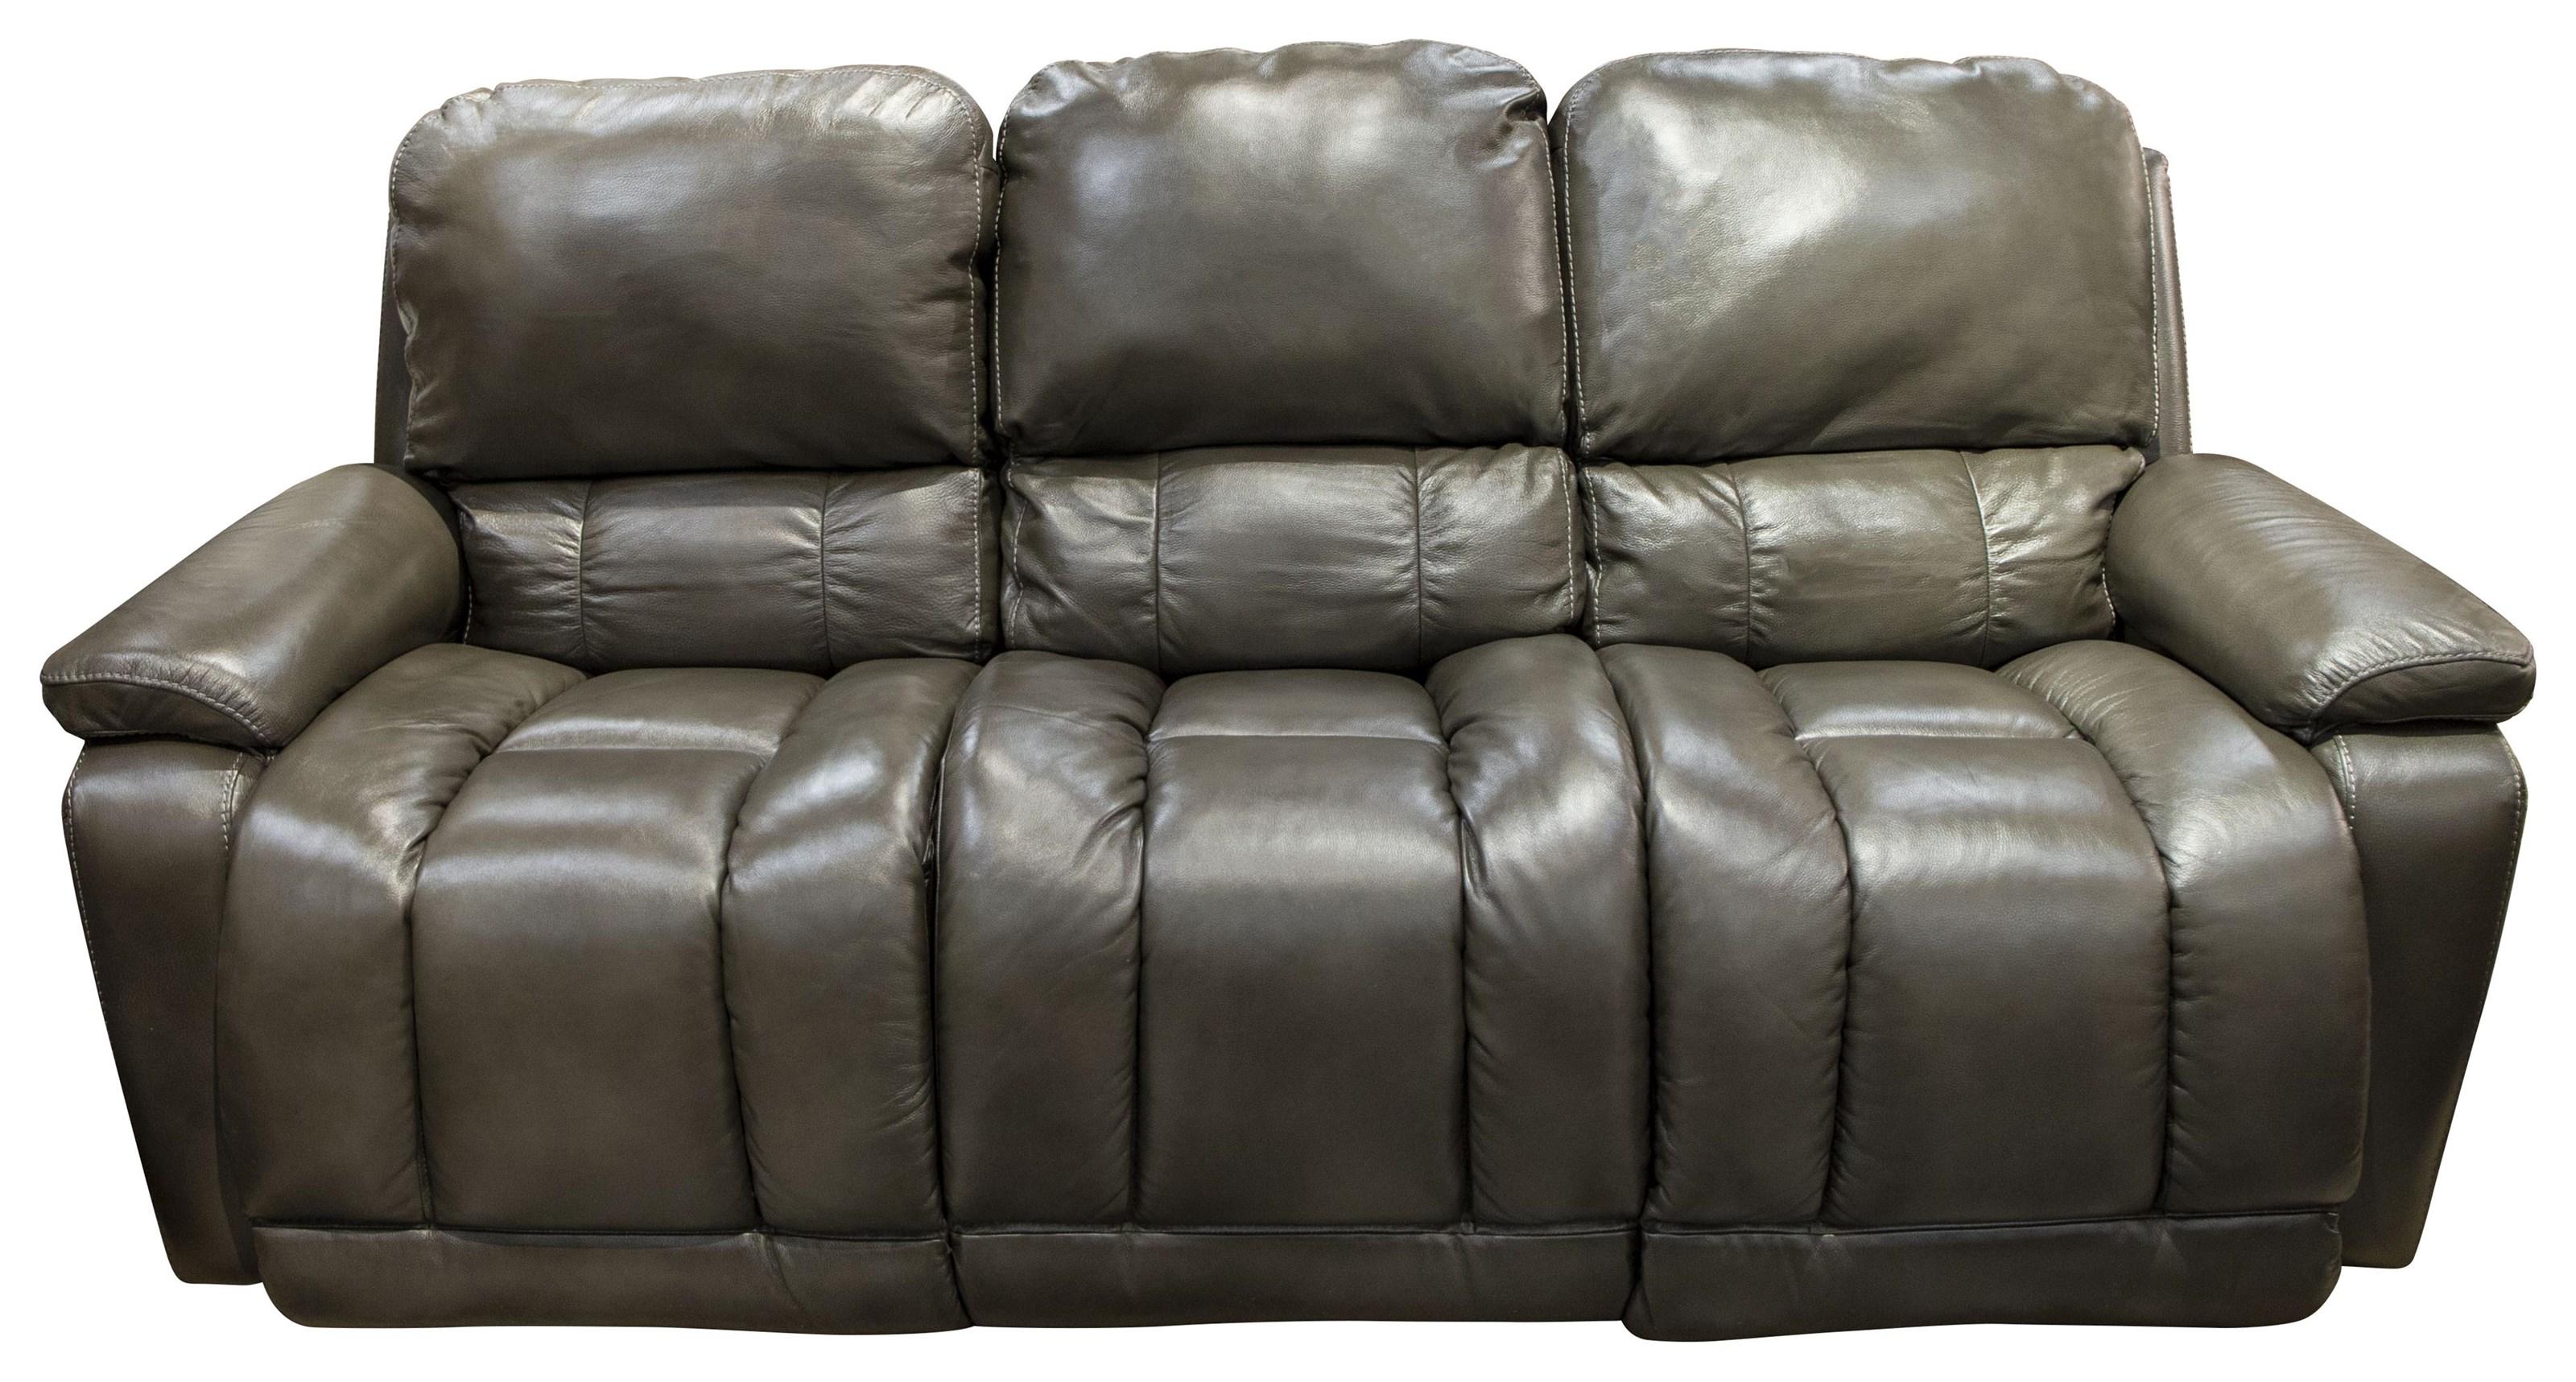 Greyson Greyson Leather Power Sofa by La-Z-Boy at Morris Home